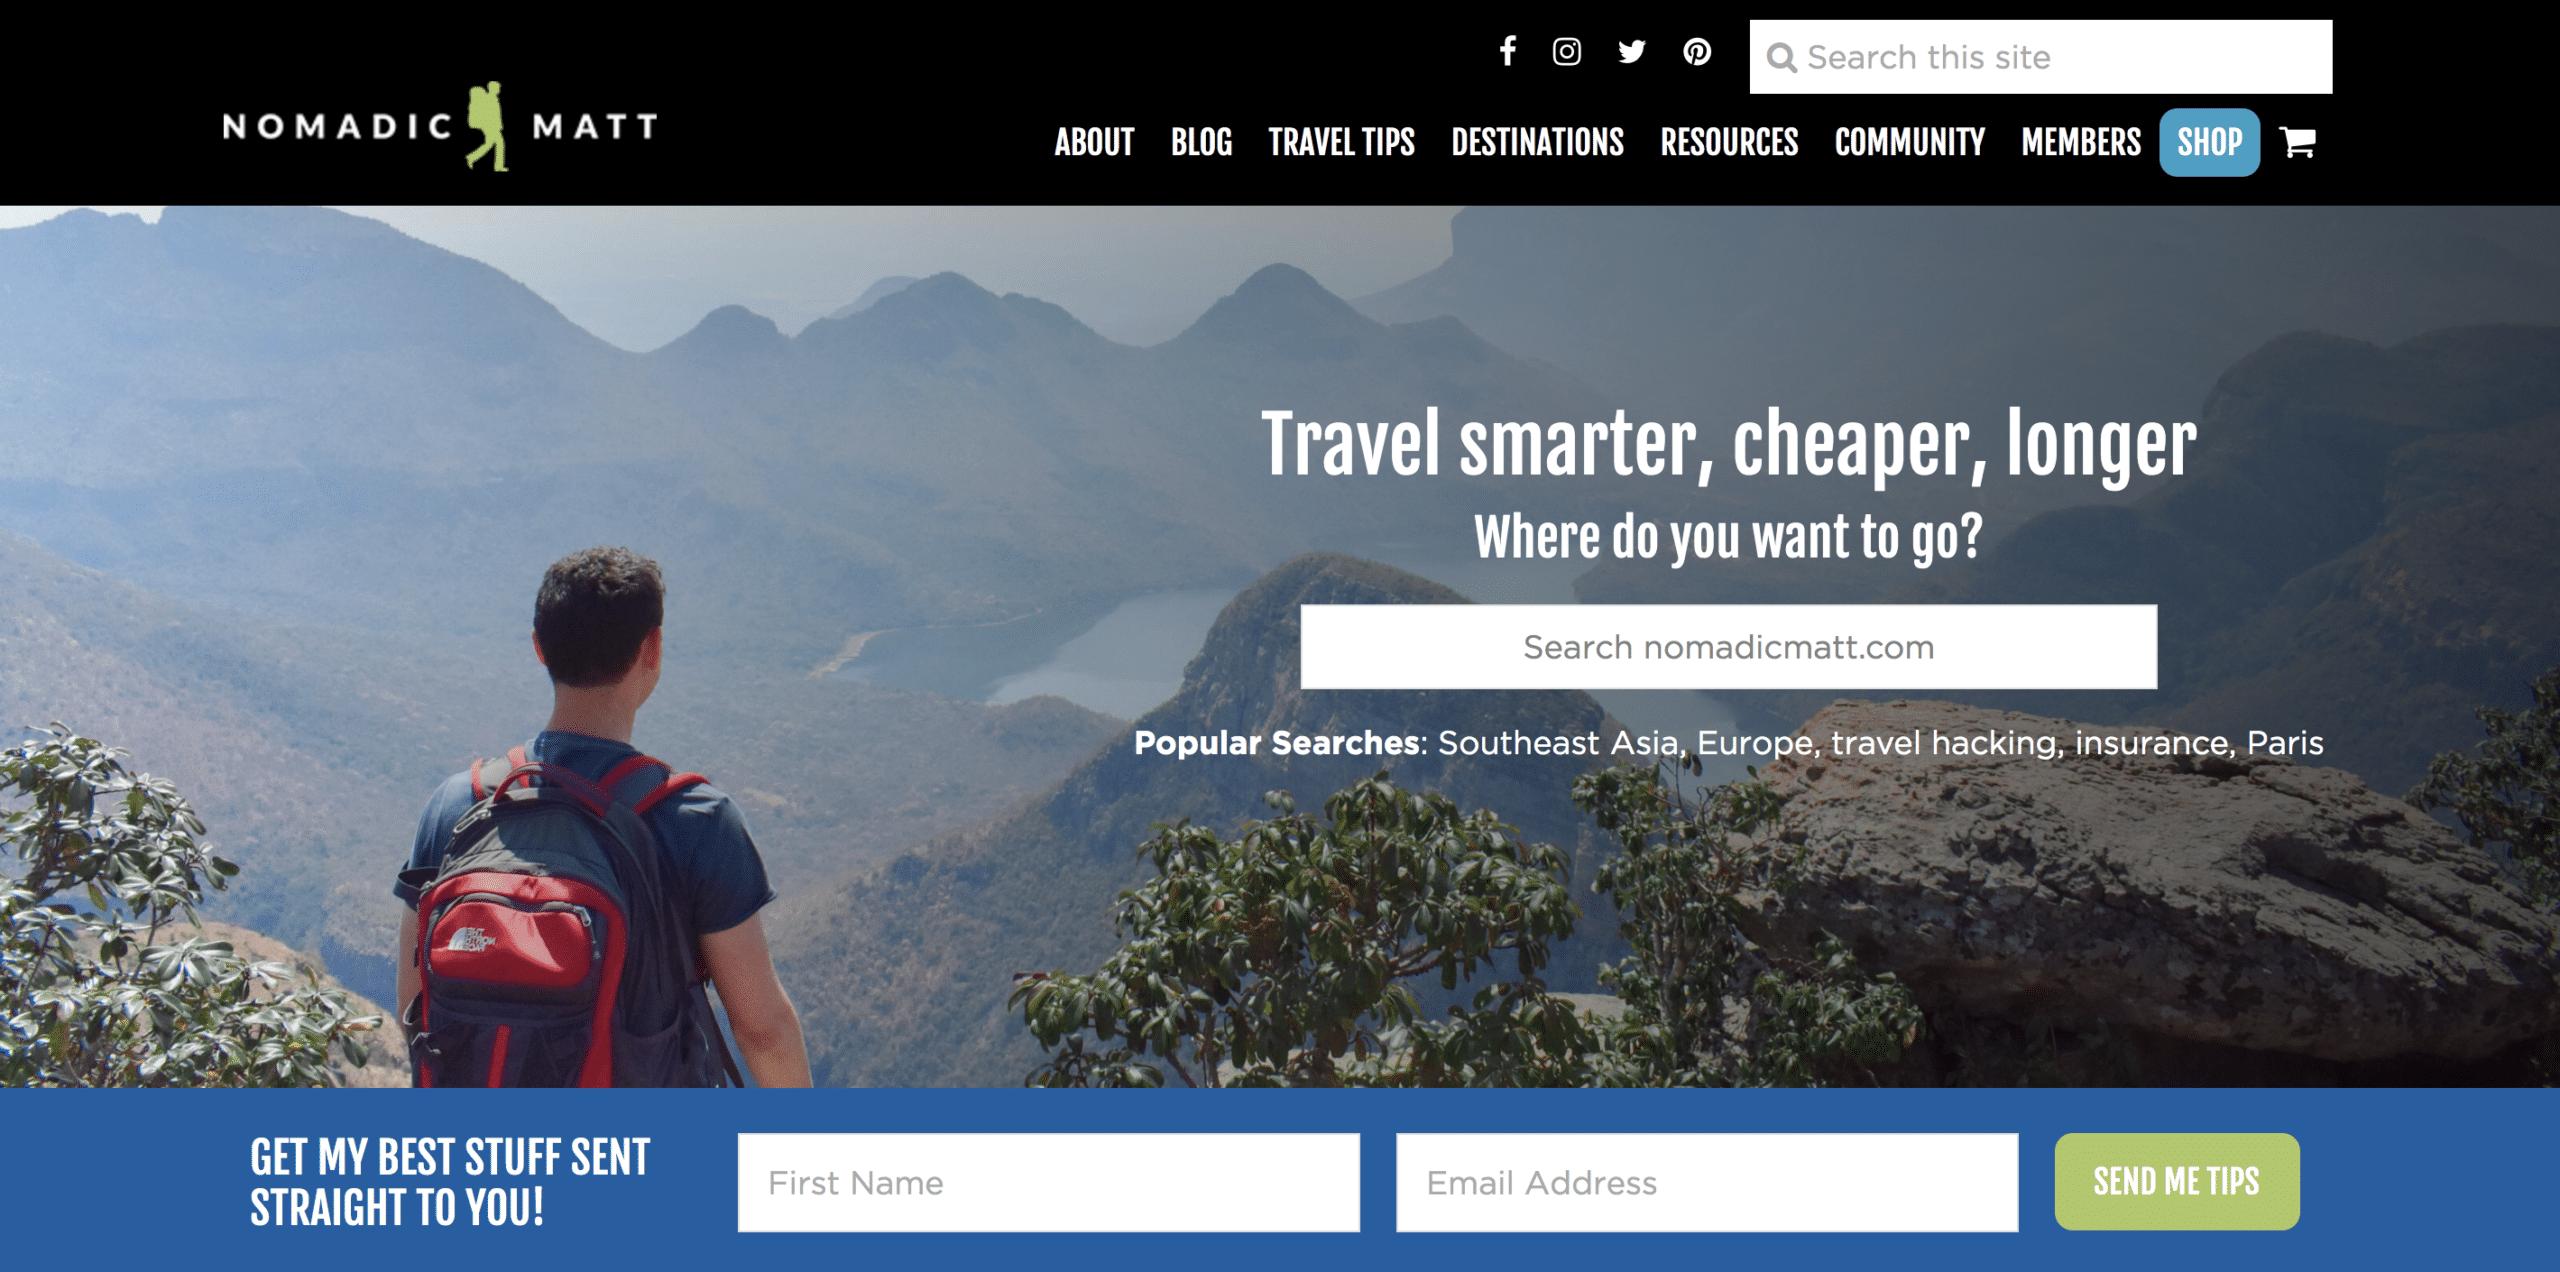 travel blog nomadic matt website homepage